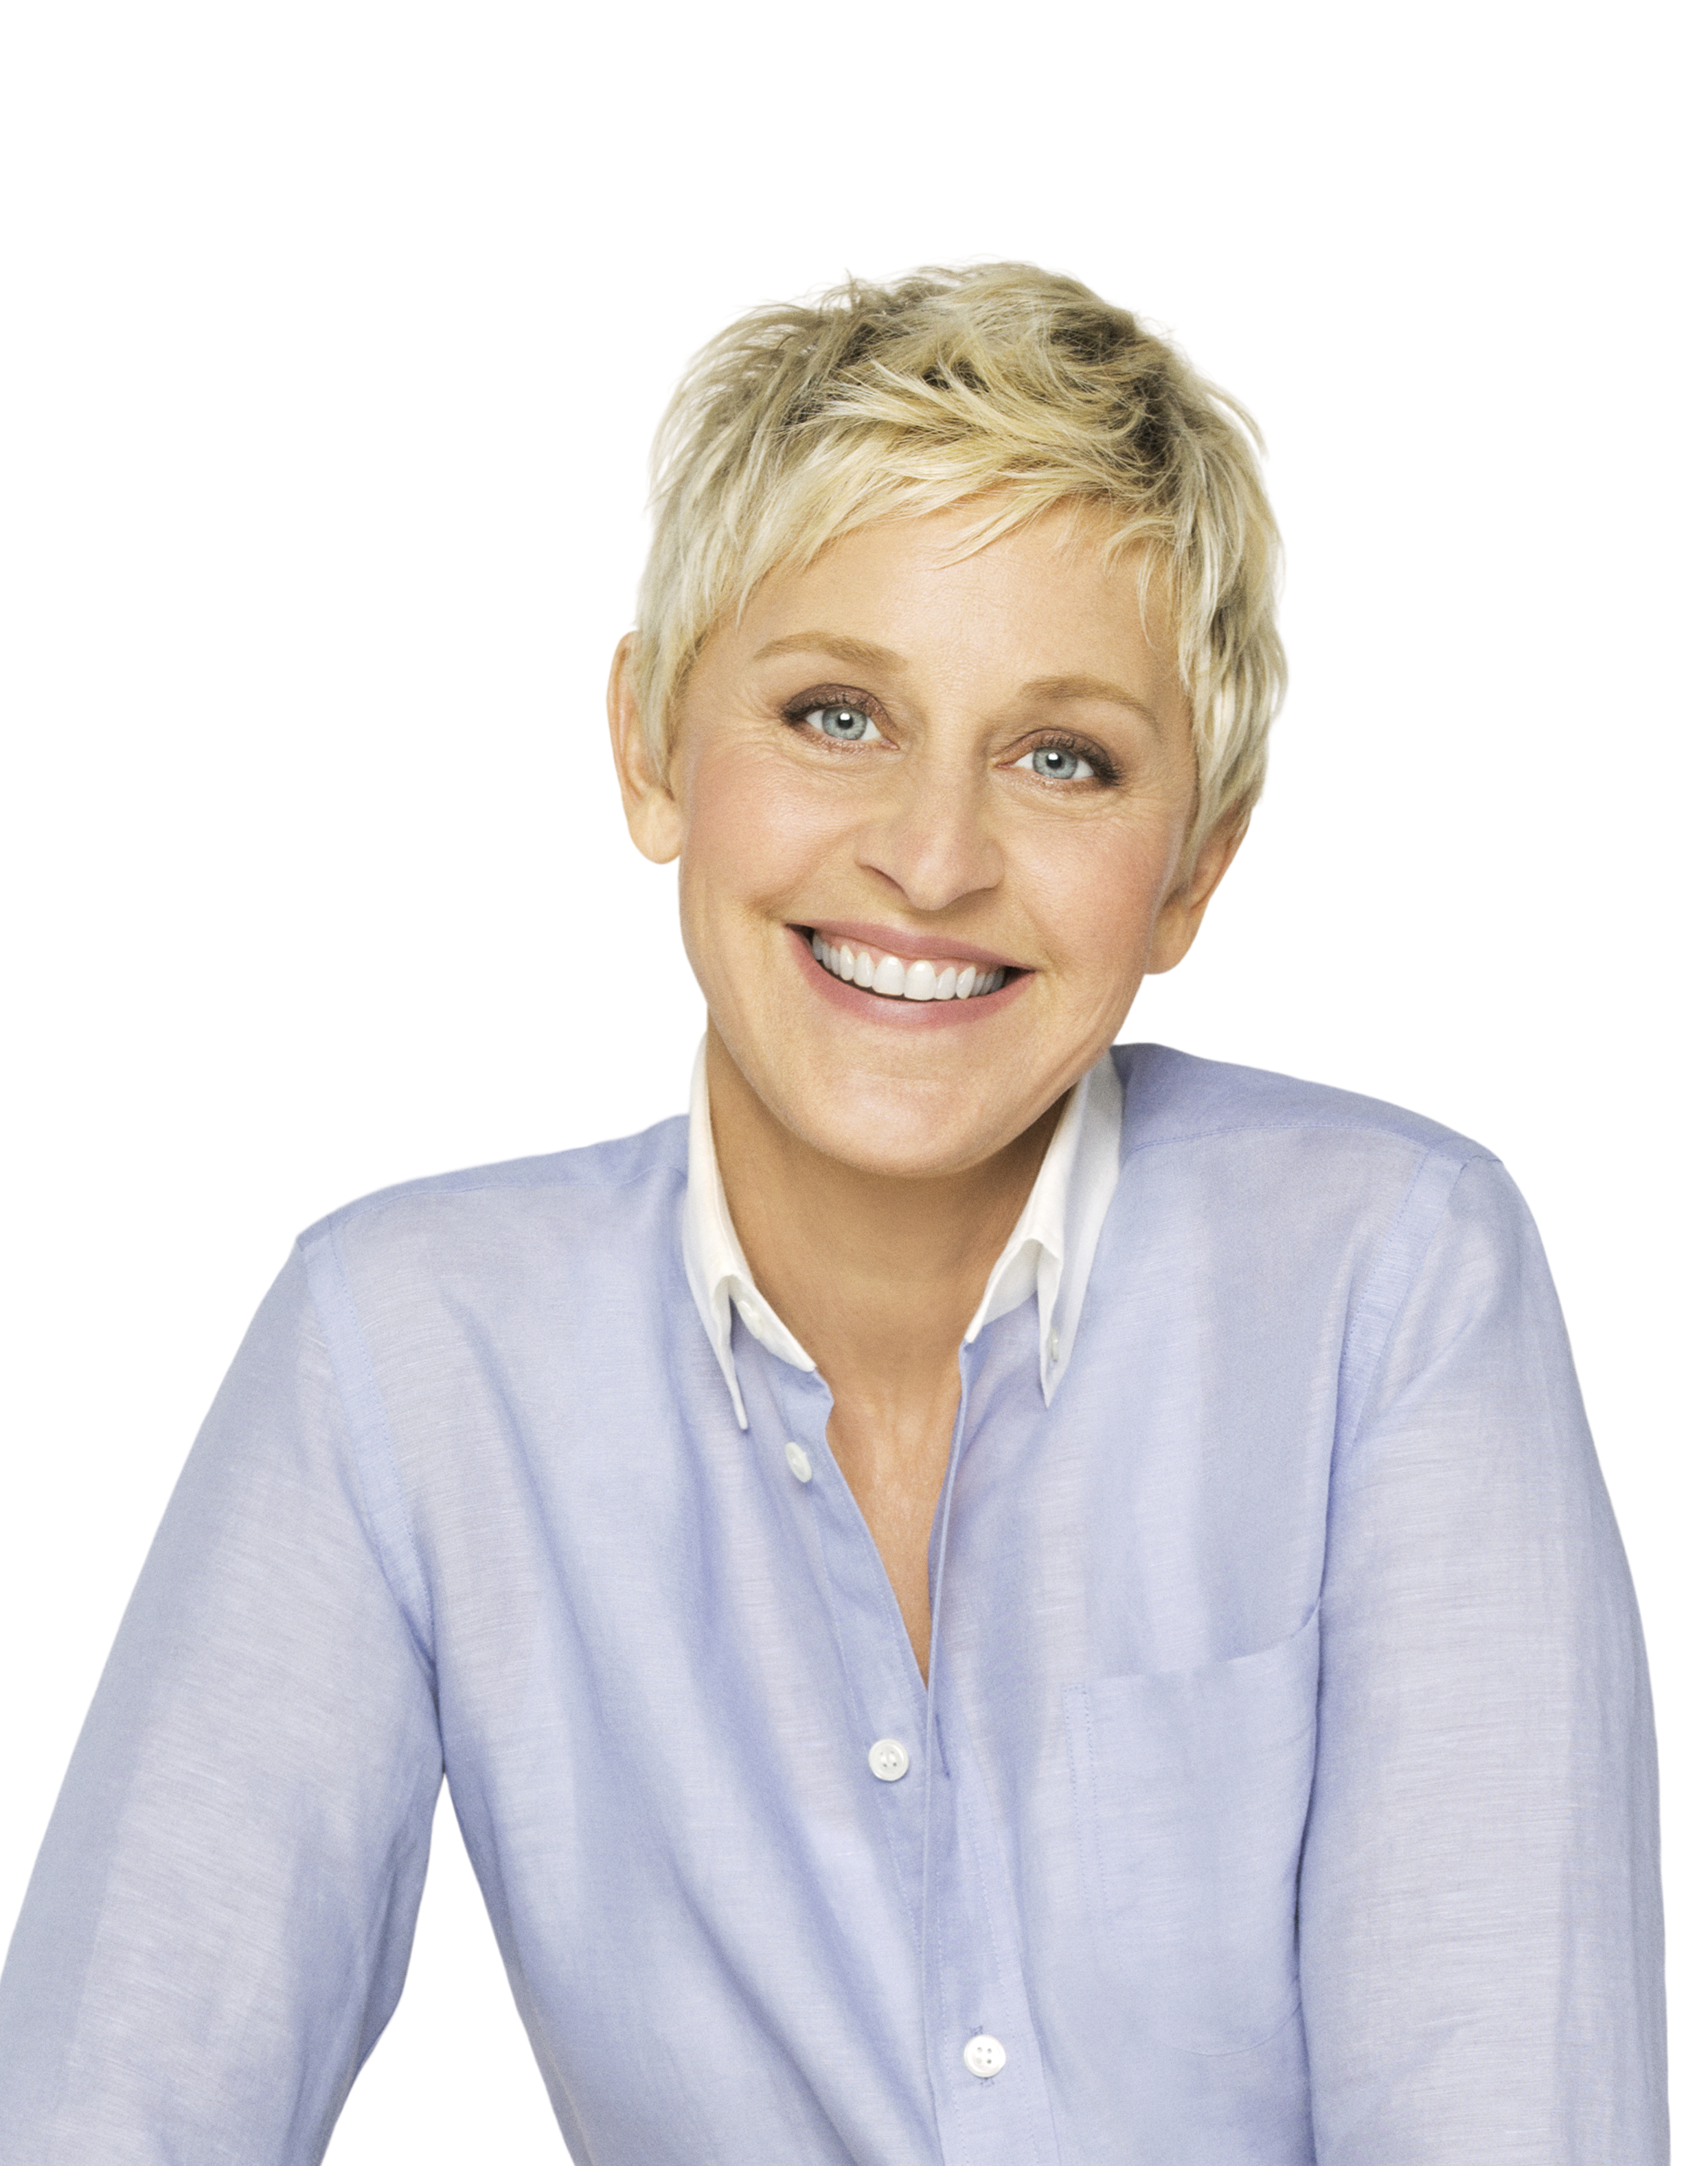 Ellen DeGeneres Net Worth, Age, Height, Wife, Profile, Tickets